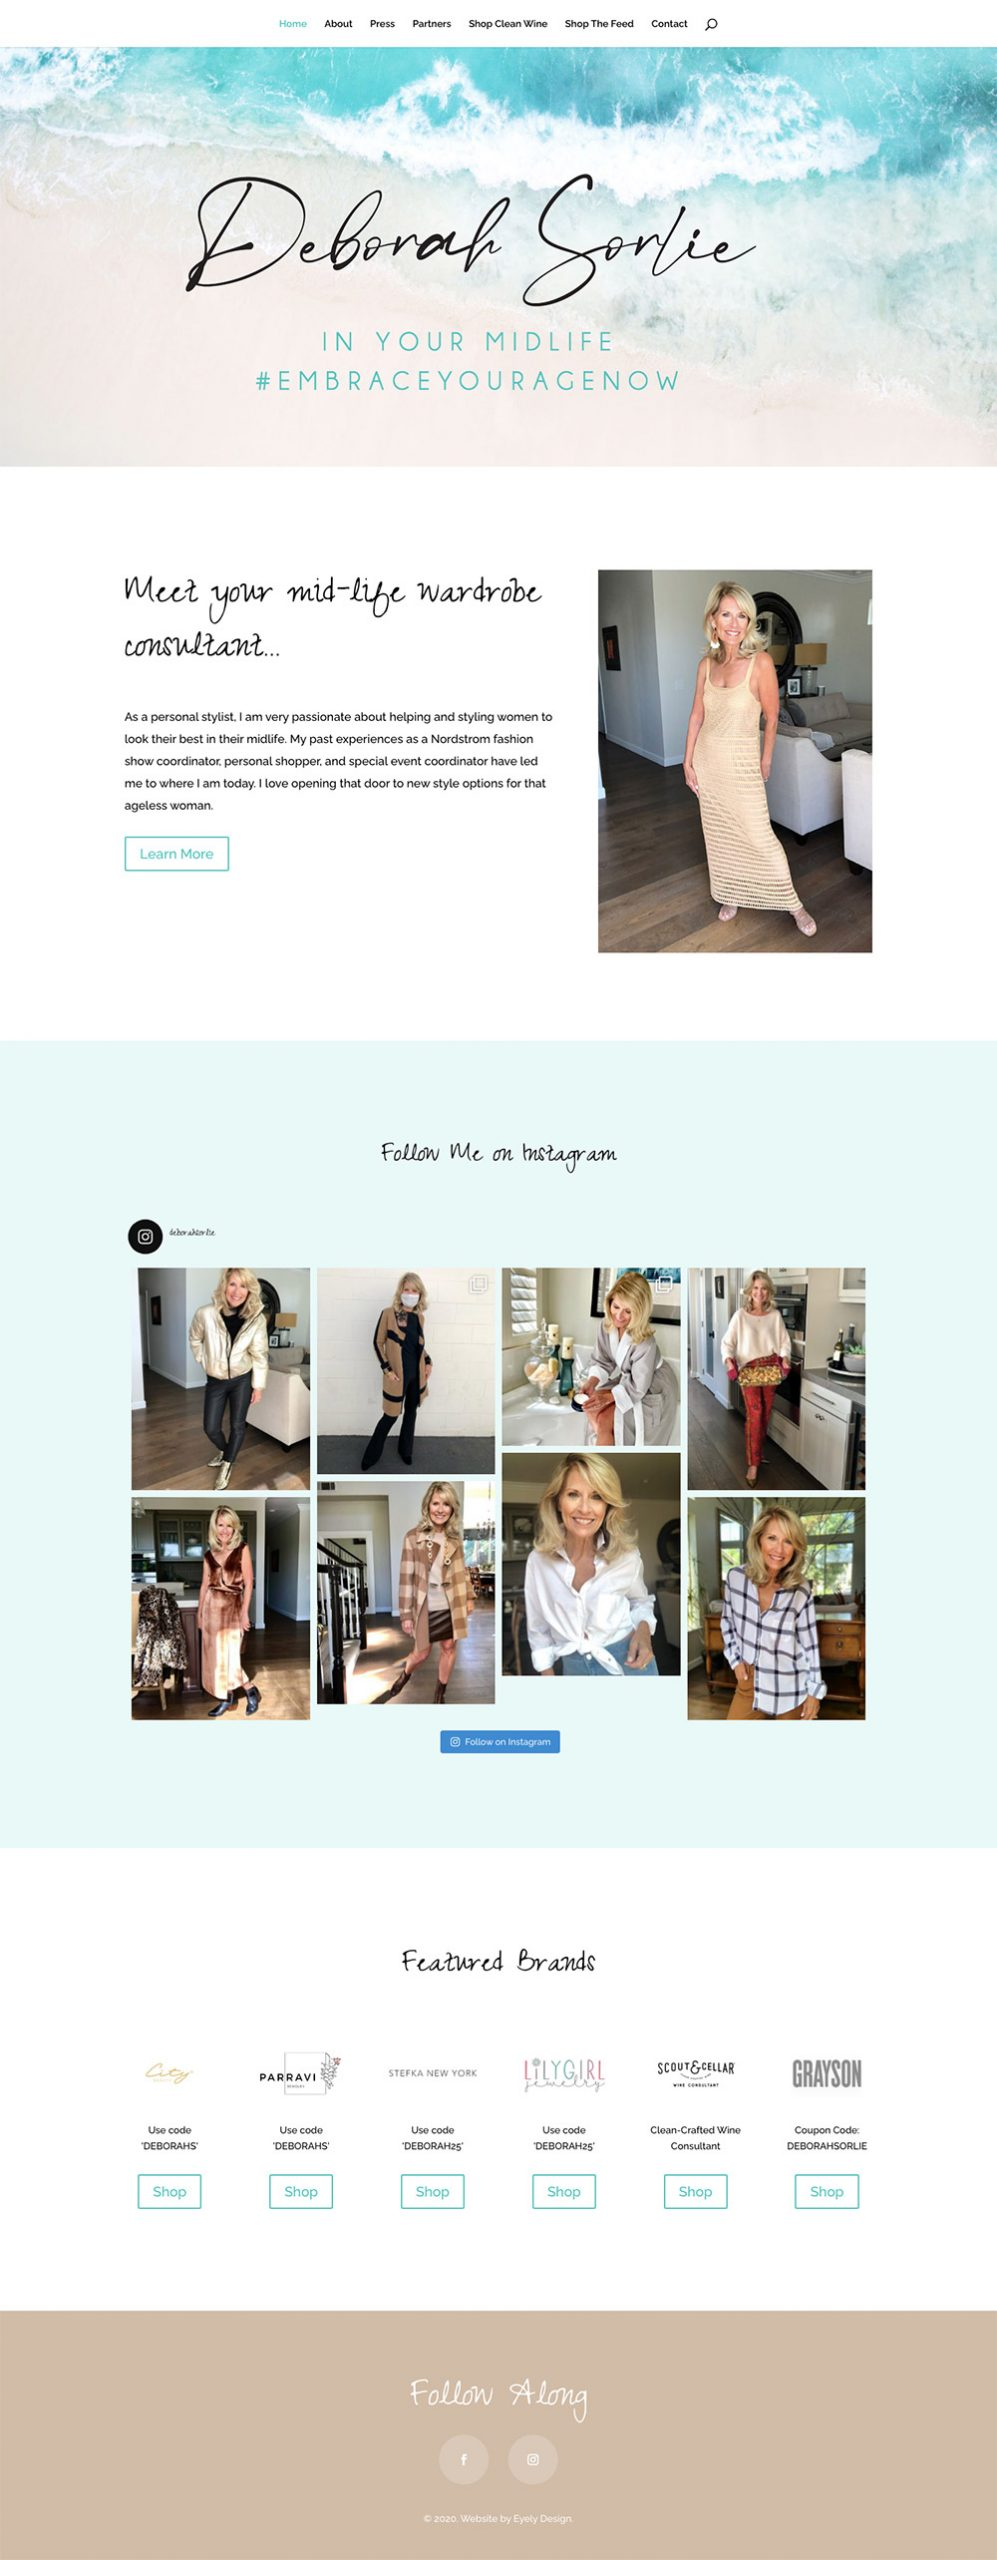 Deborah Sorlie website design